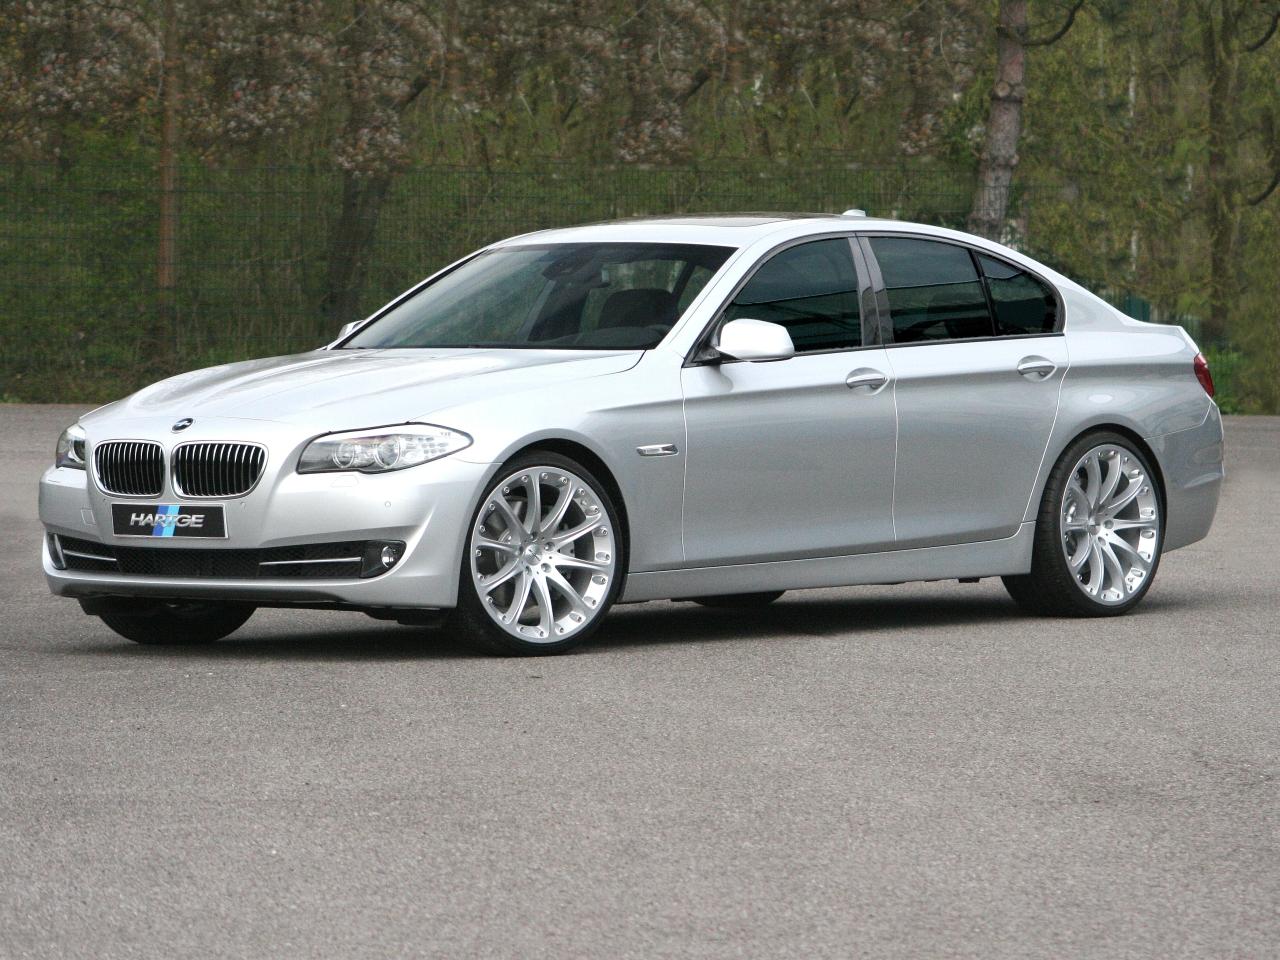 Hartge BMW F10 520d Gets 218 hp: Acceleration Test